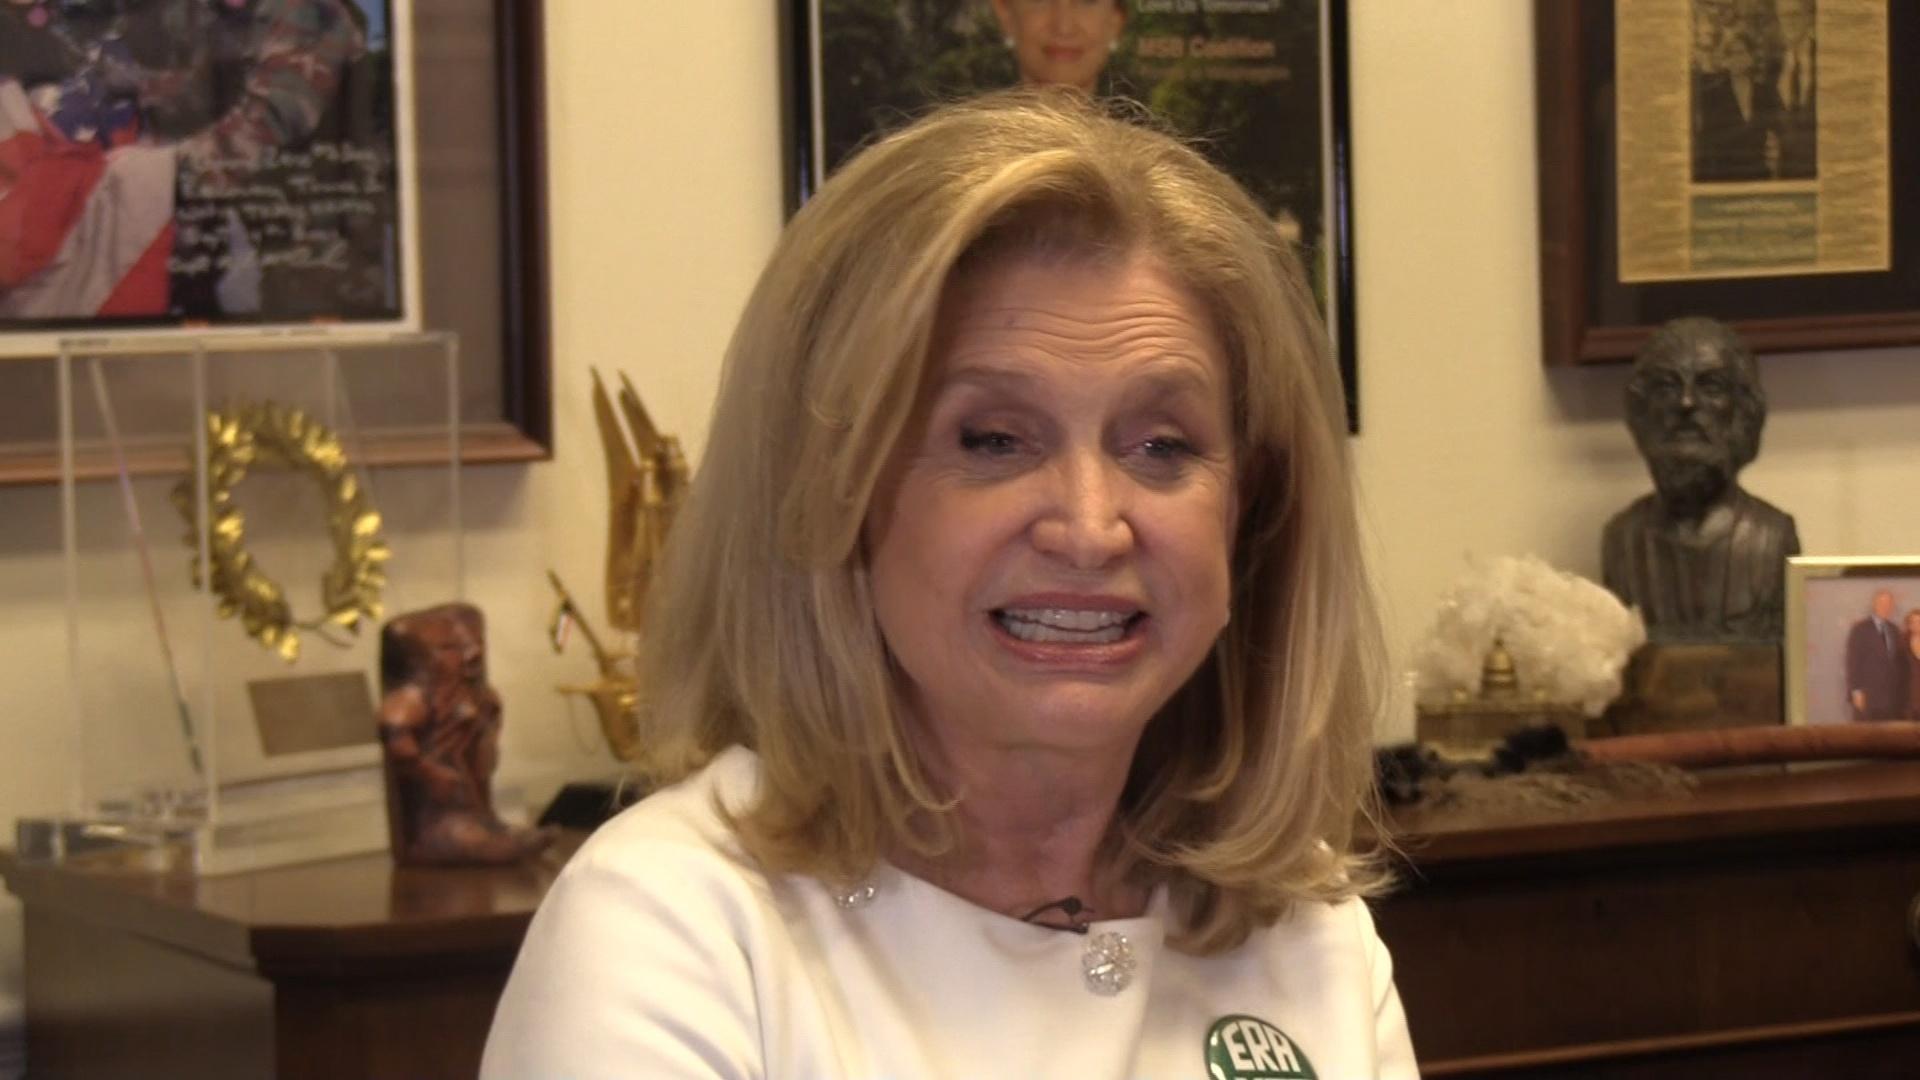 Rep. Carolyn Maloney on Equal Rights Amendment & Trump